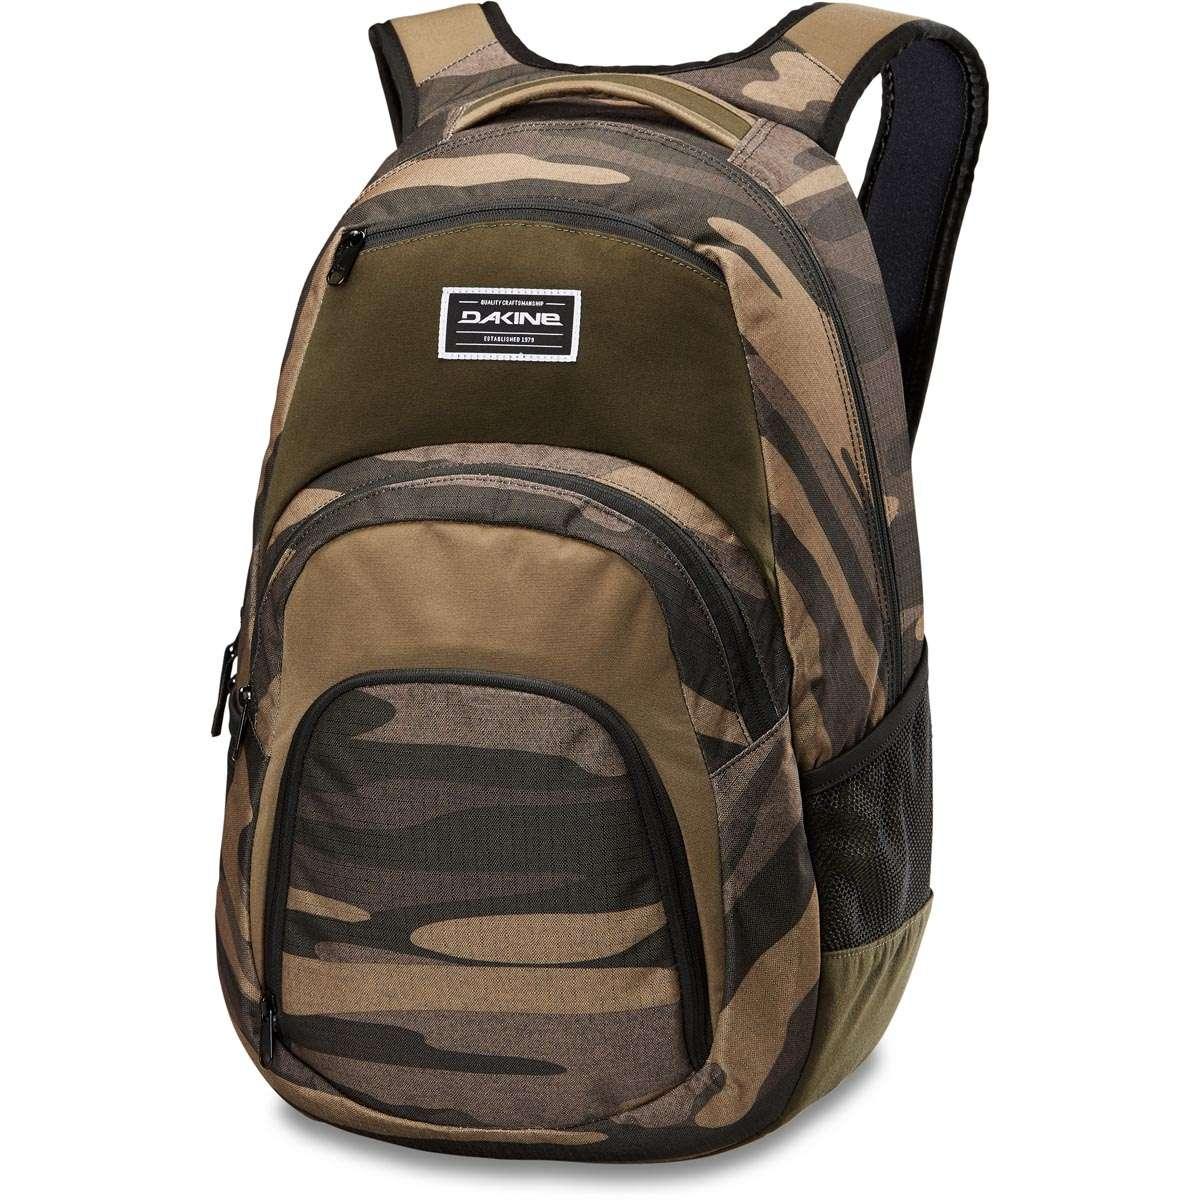 016f5baee1be9 Dakine Campus 33L Backpack Field Camo